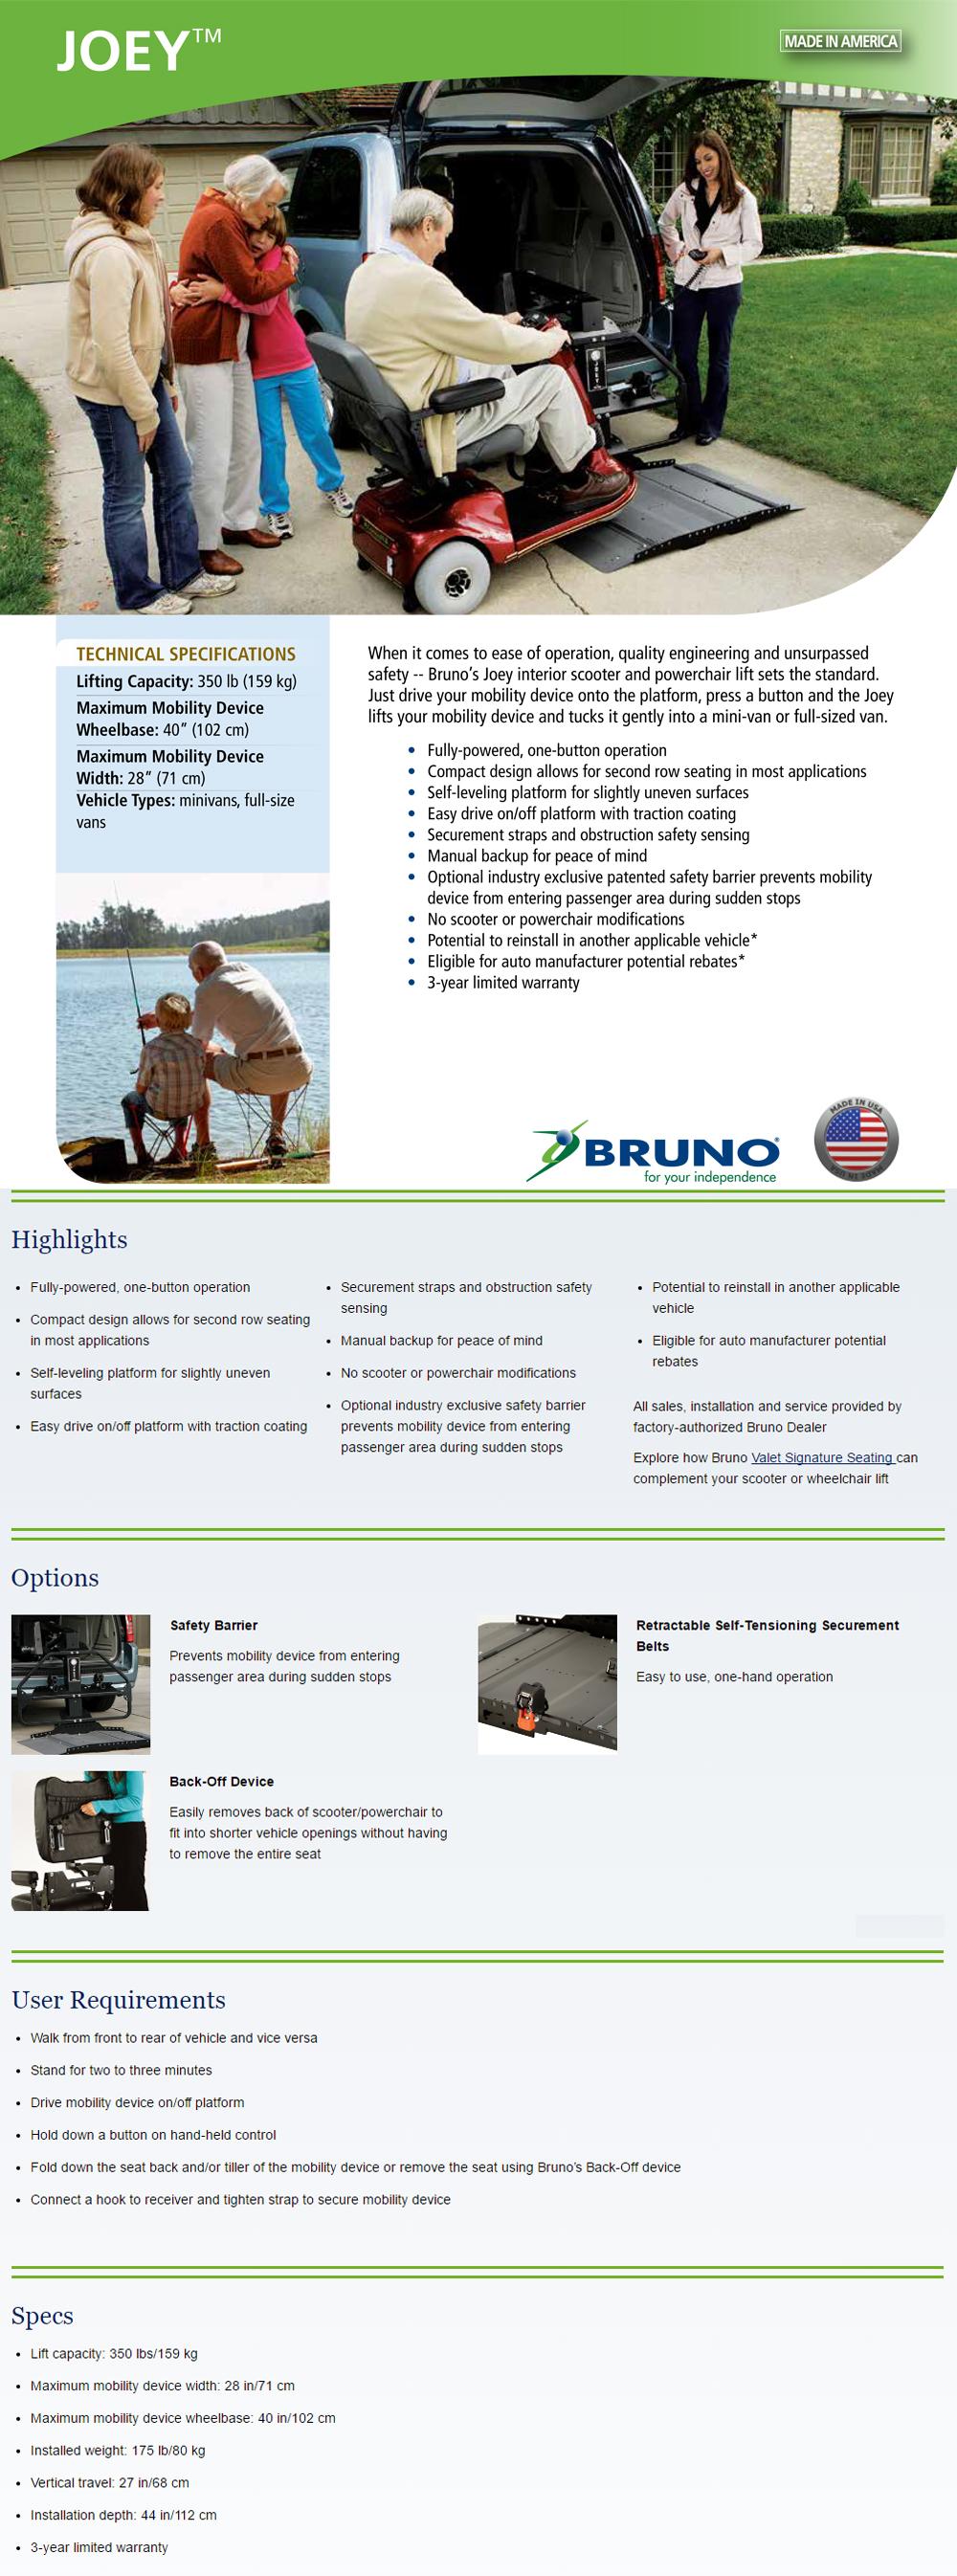 Bruno-VSL-4000HW-Joey-electric-lift